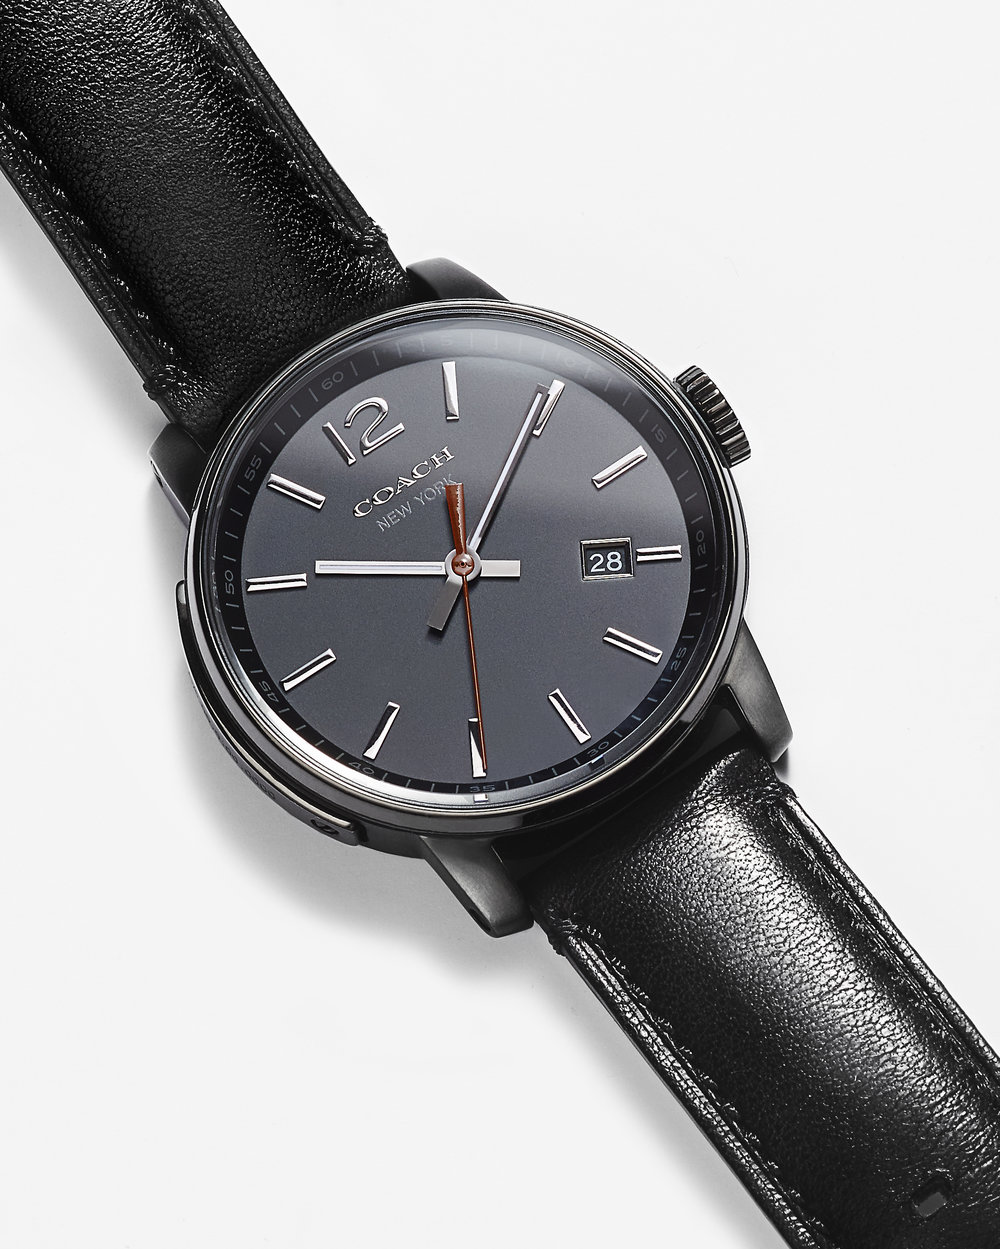 watchcloseup.jpg